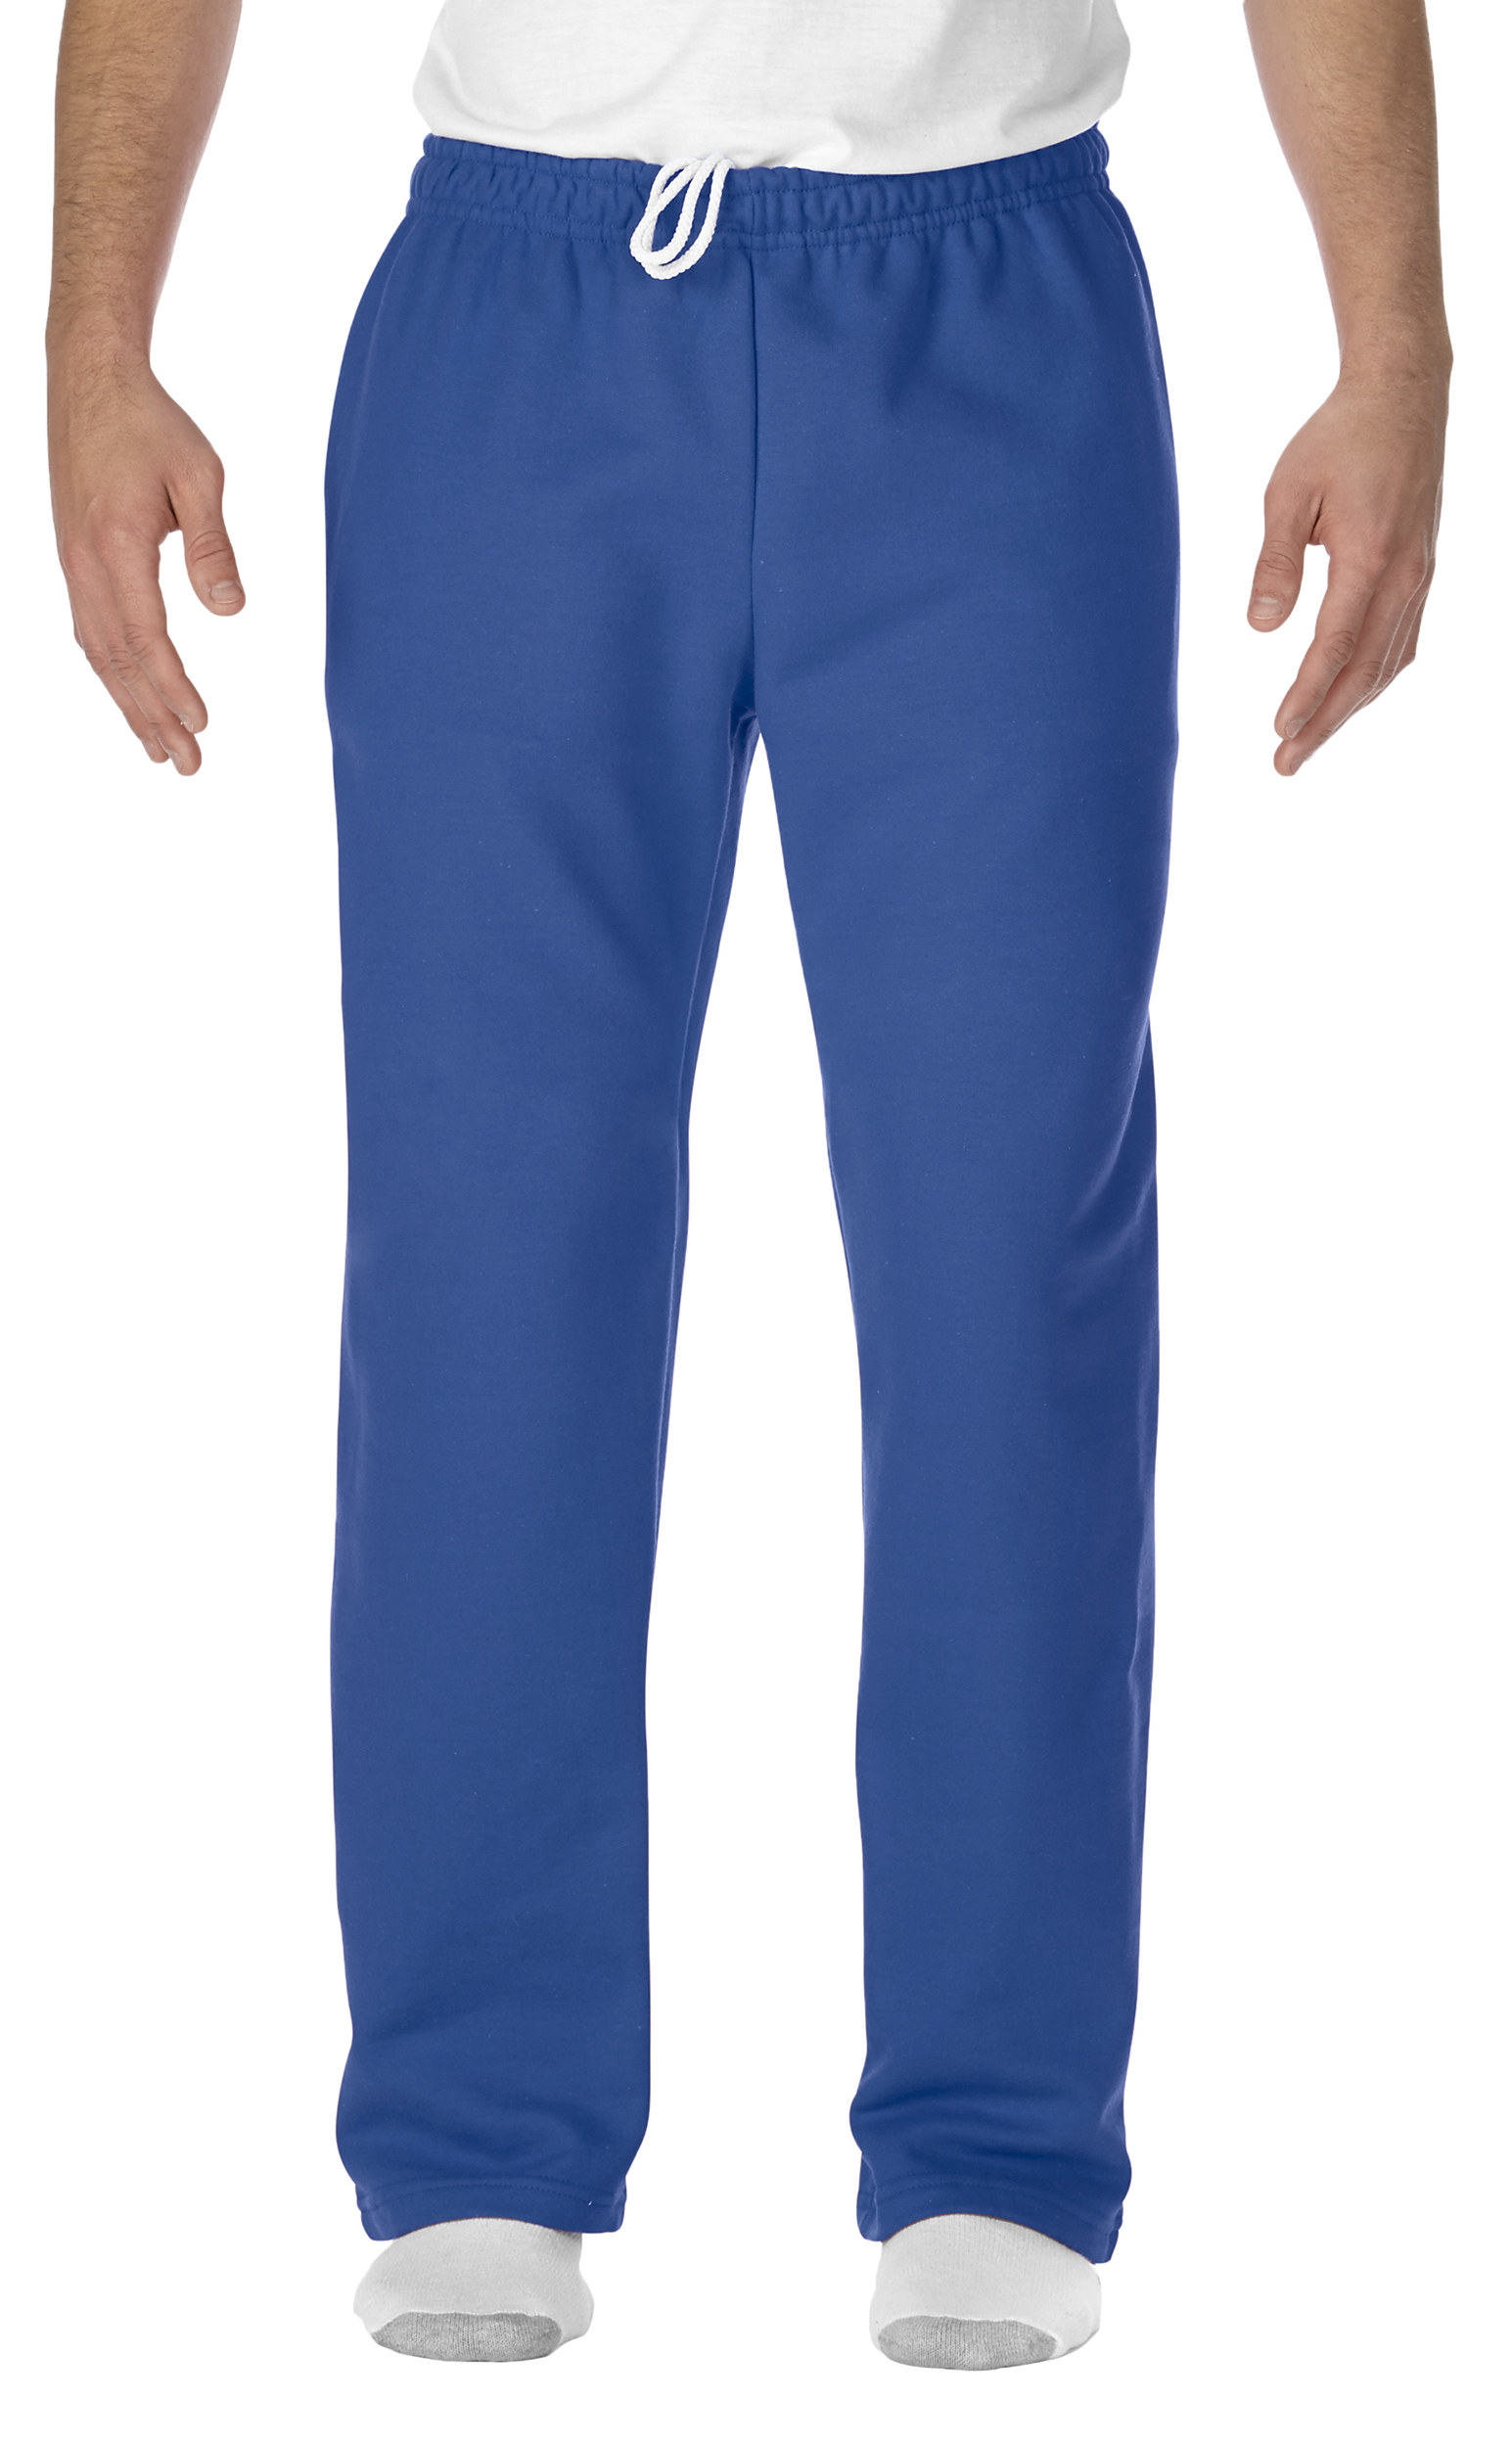 The blue sweatpants